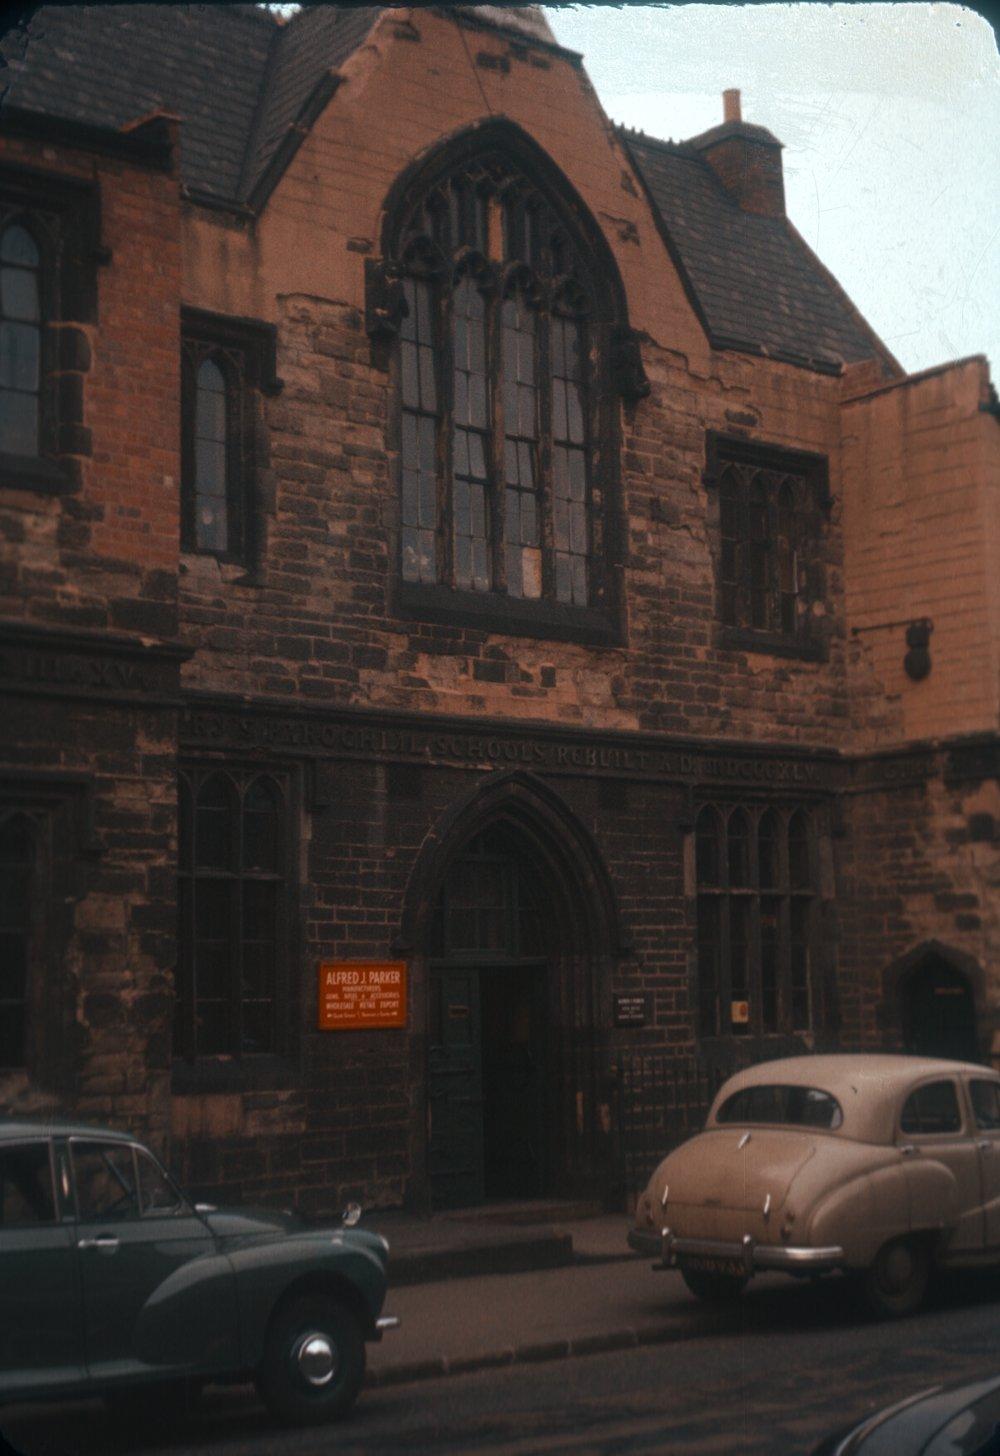 Gun Quarter Bath Street. St Mary's School rebuilt 1845. (Gunworks in 1960) 25th March 1960